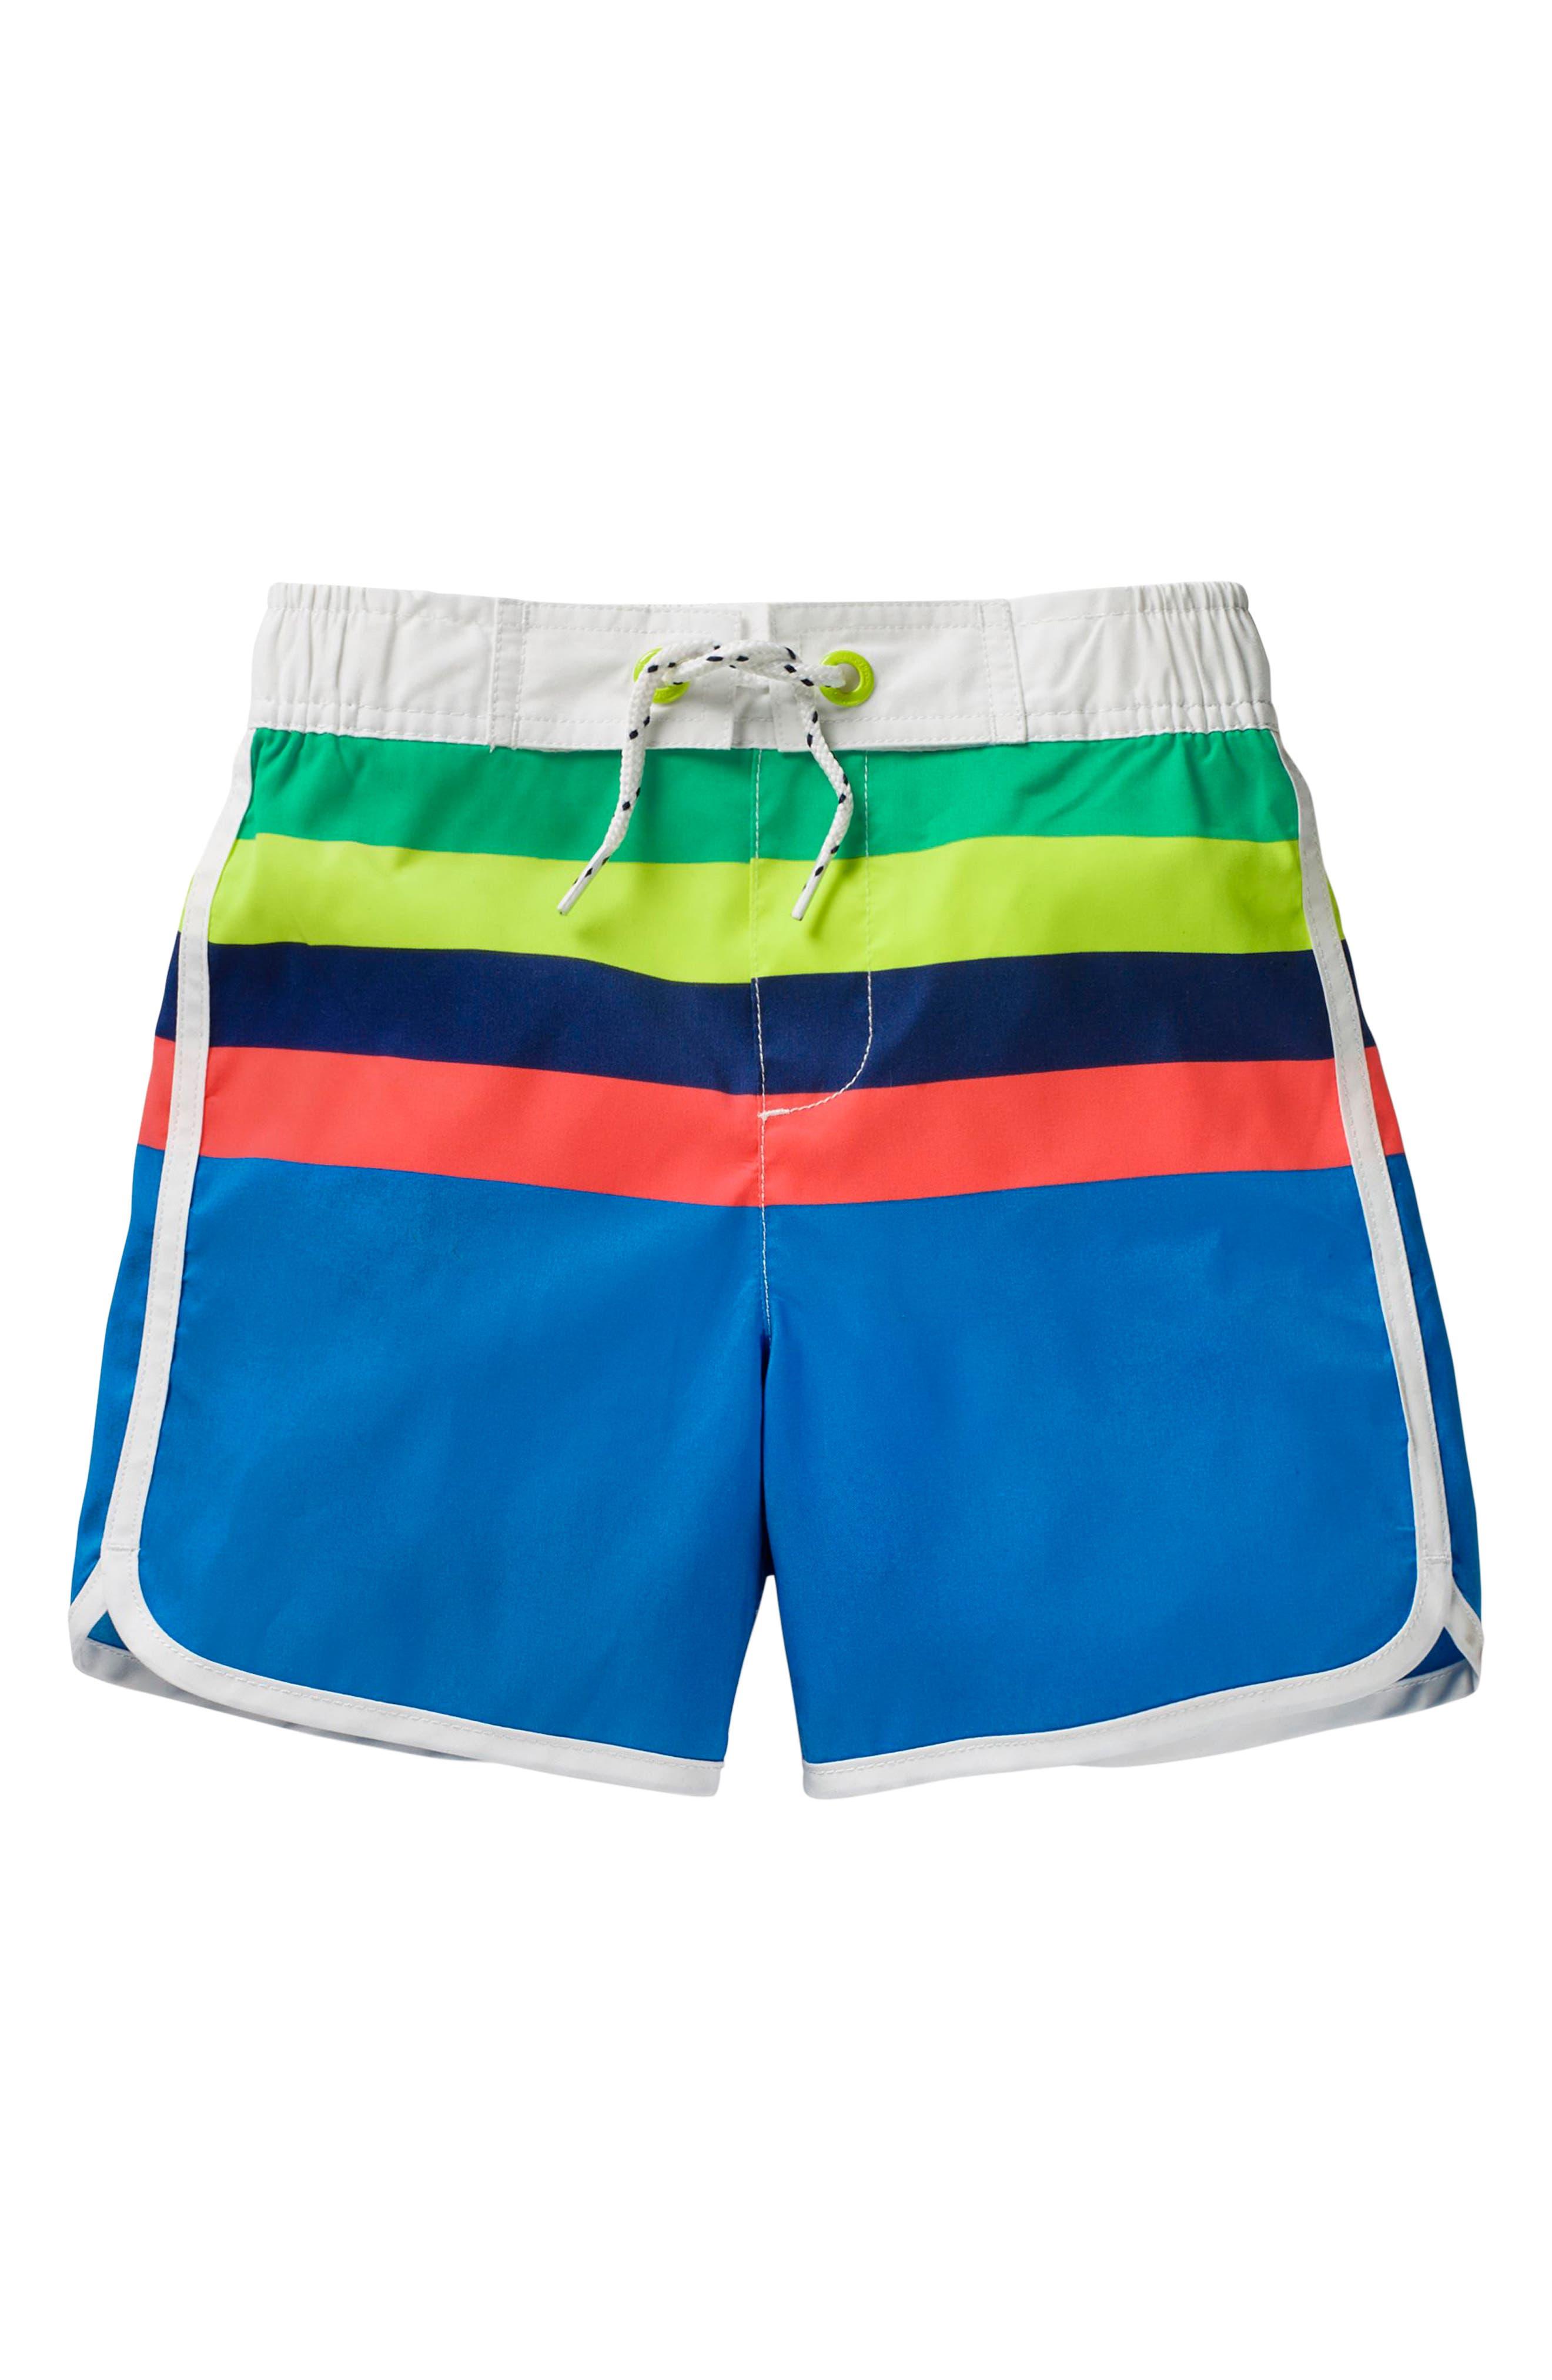 Stripe Board Shorts,                         Main,                         color, Electric Blue/ Lemonade Multi